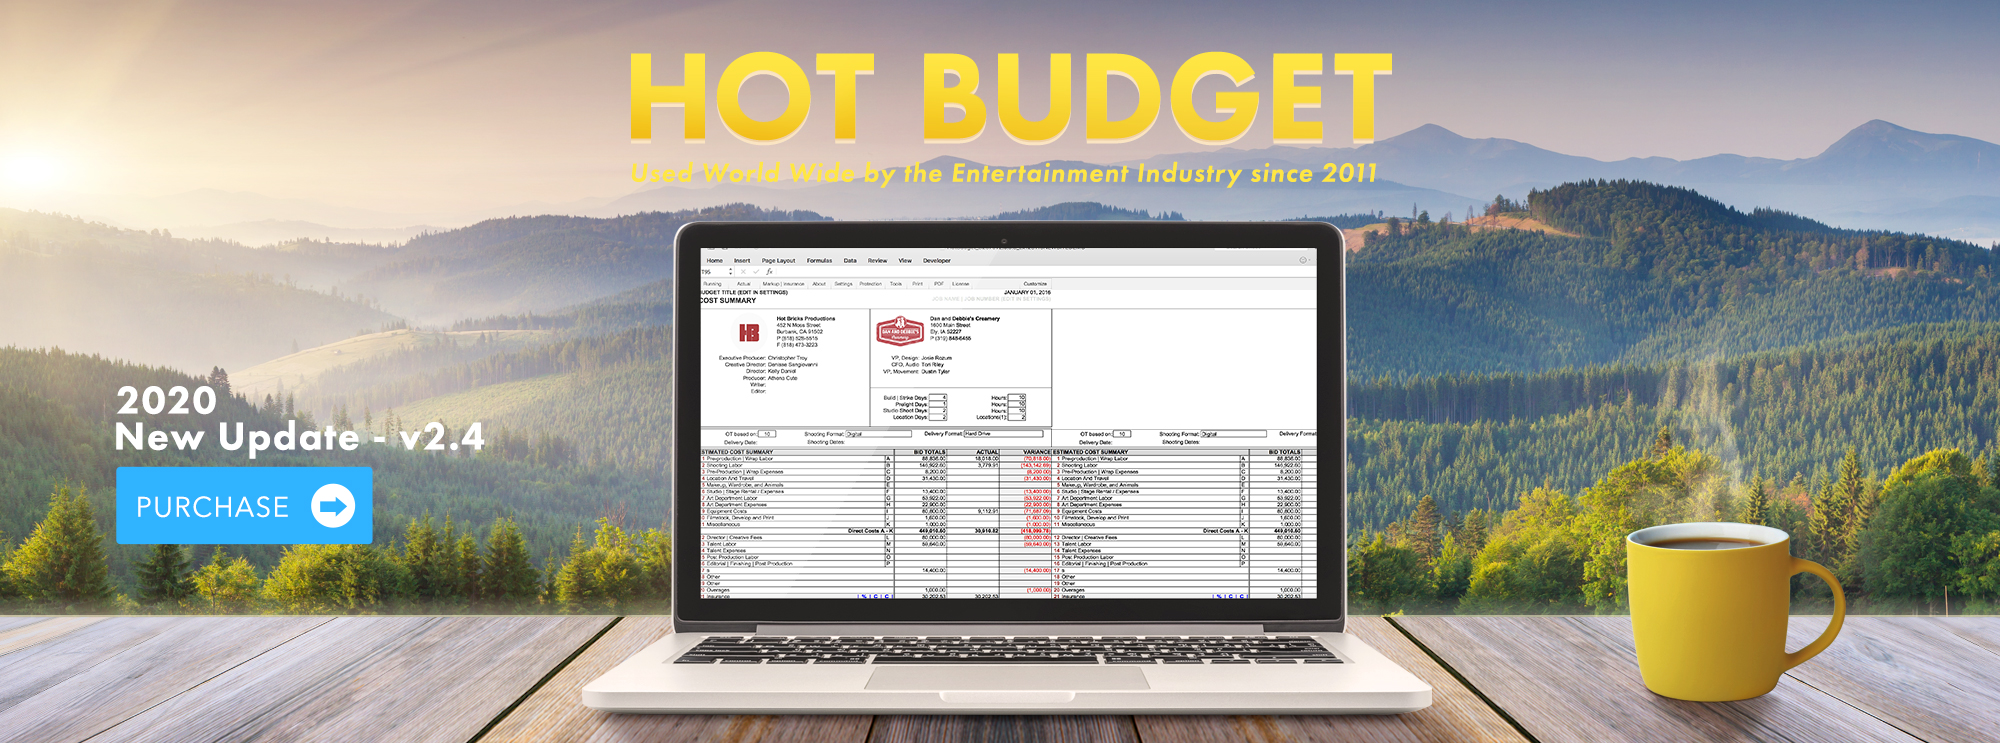 hot budget 2020 v2.4